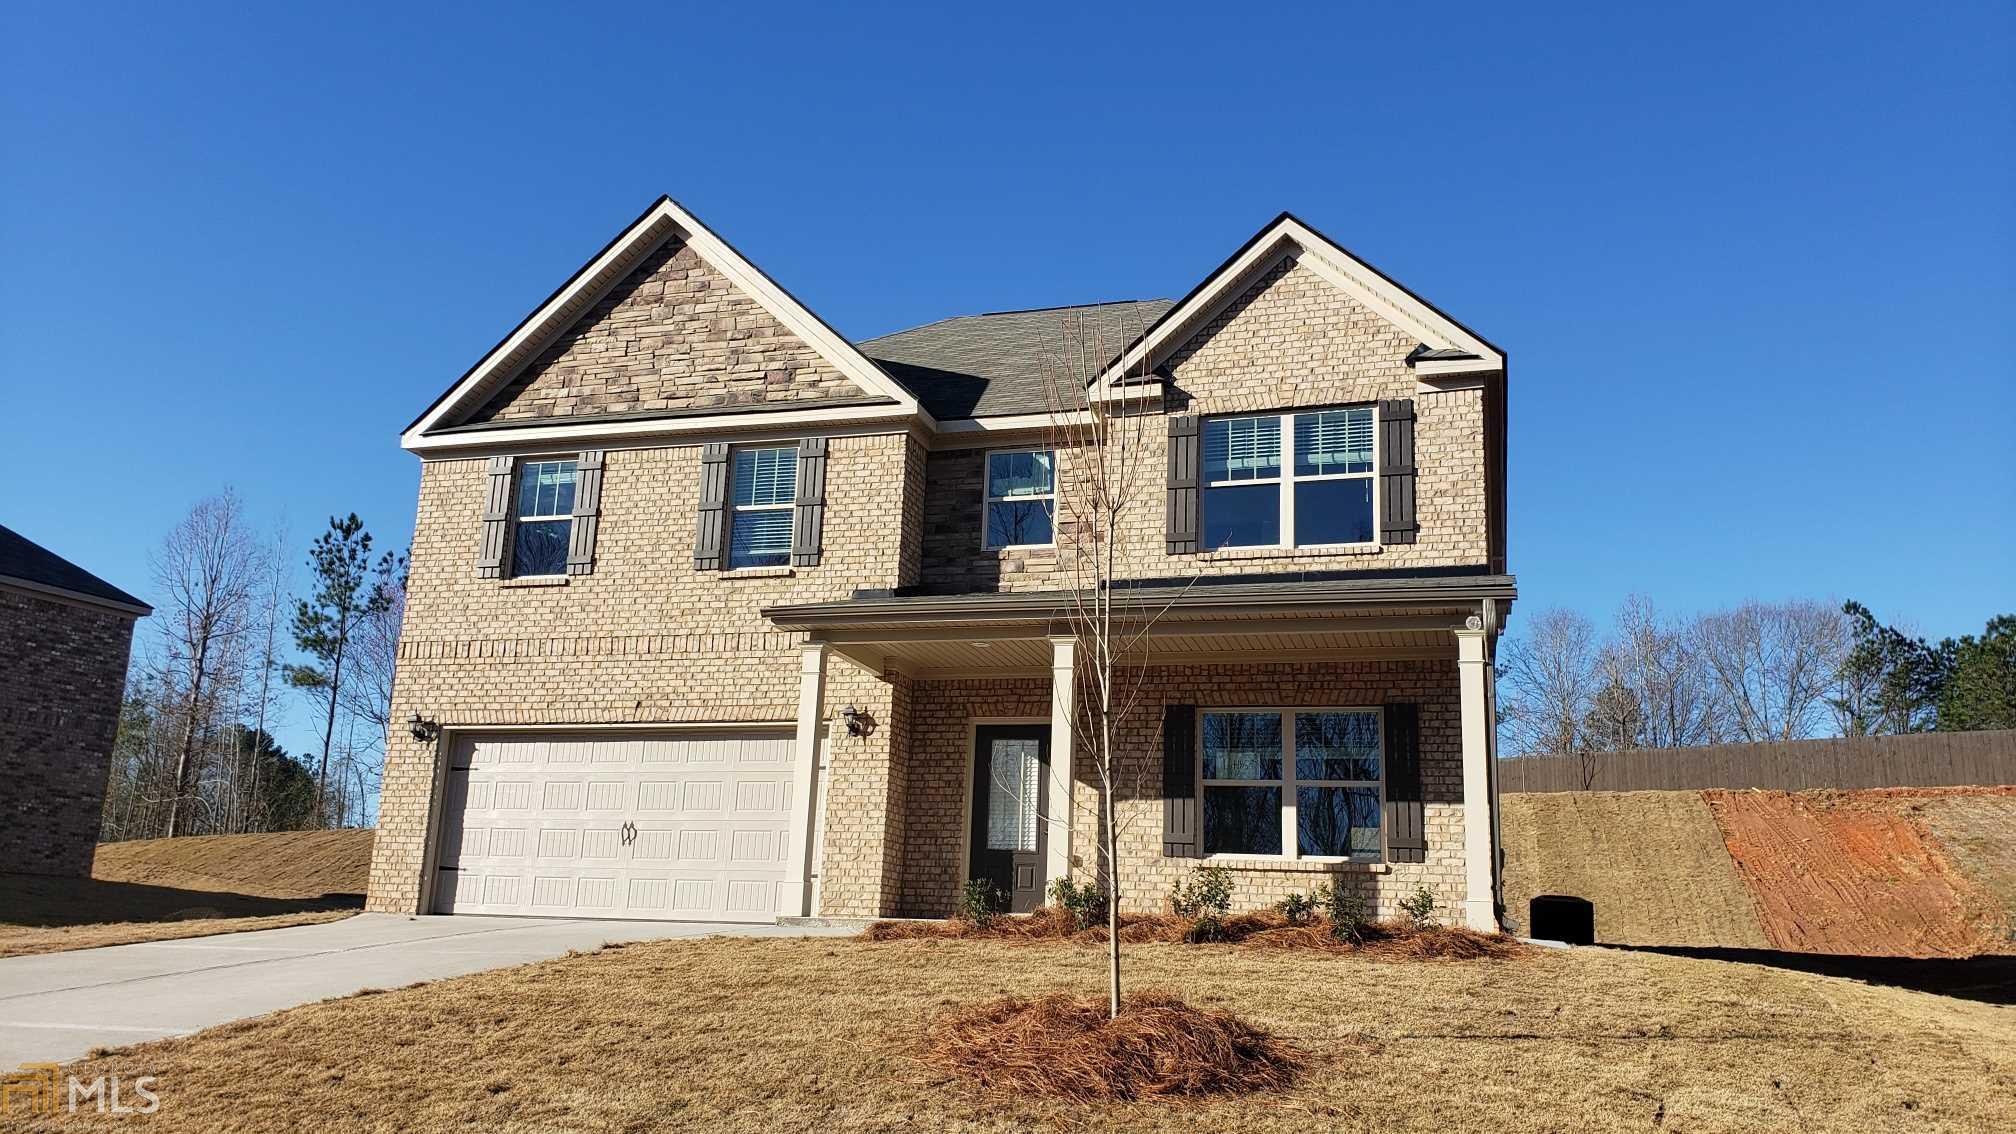 416 Exploration Trce, Ellenwood, Georgia 30294, 4 Bedrooms Bedrooms, ,3 BathroomsBathrooms,Single Family,For Sale,416 Exploration Trce,2,8840675